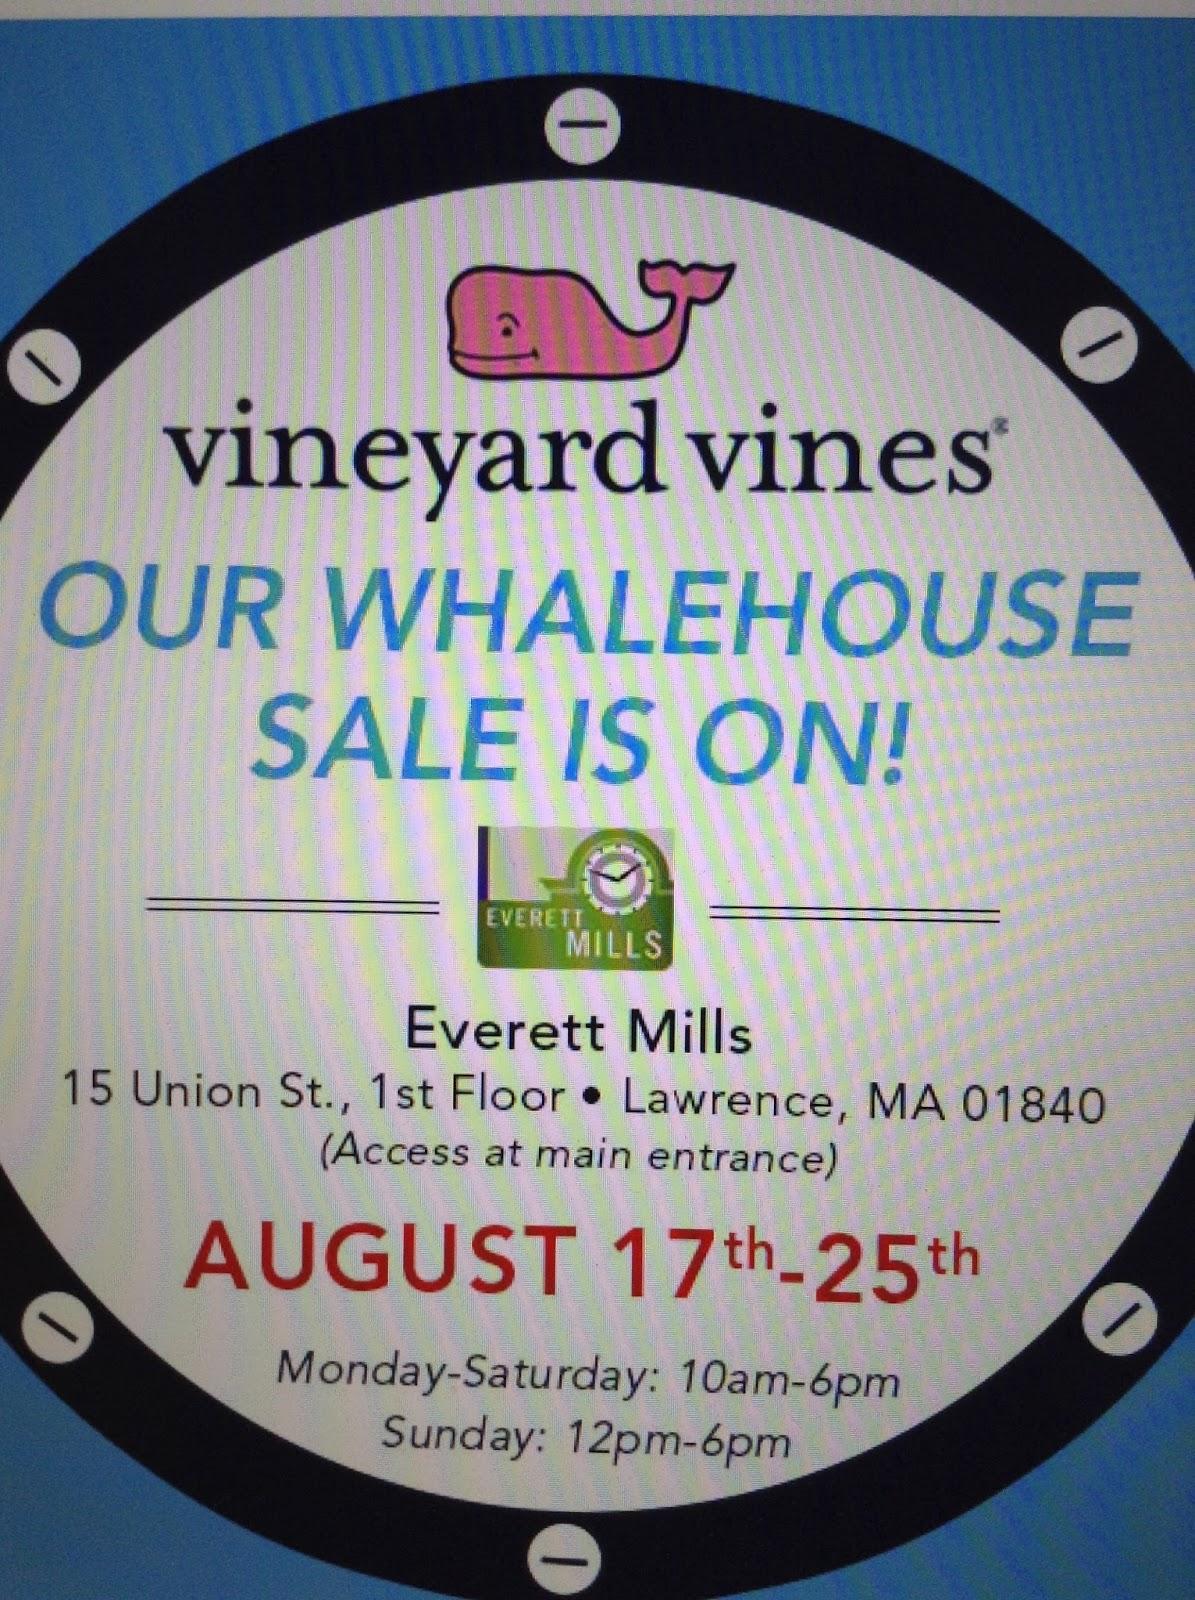 Vineyard vines whalehouse sale rhode island 2015 butik work